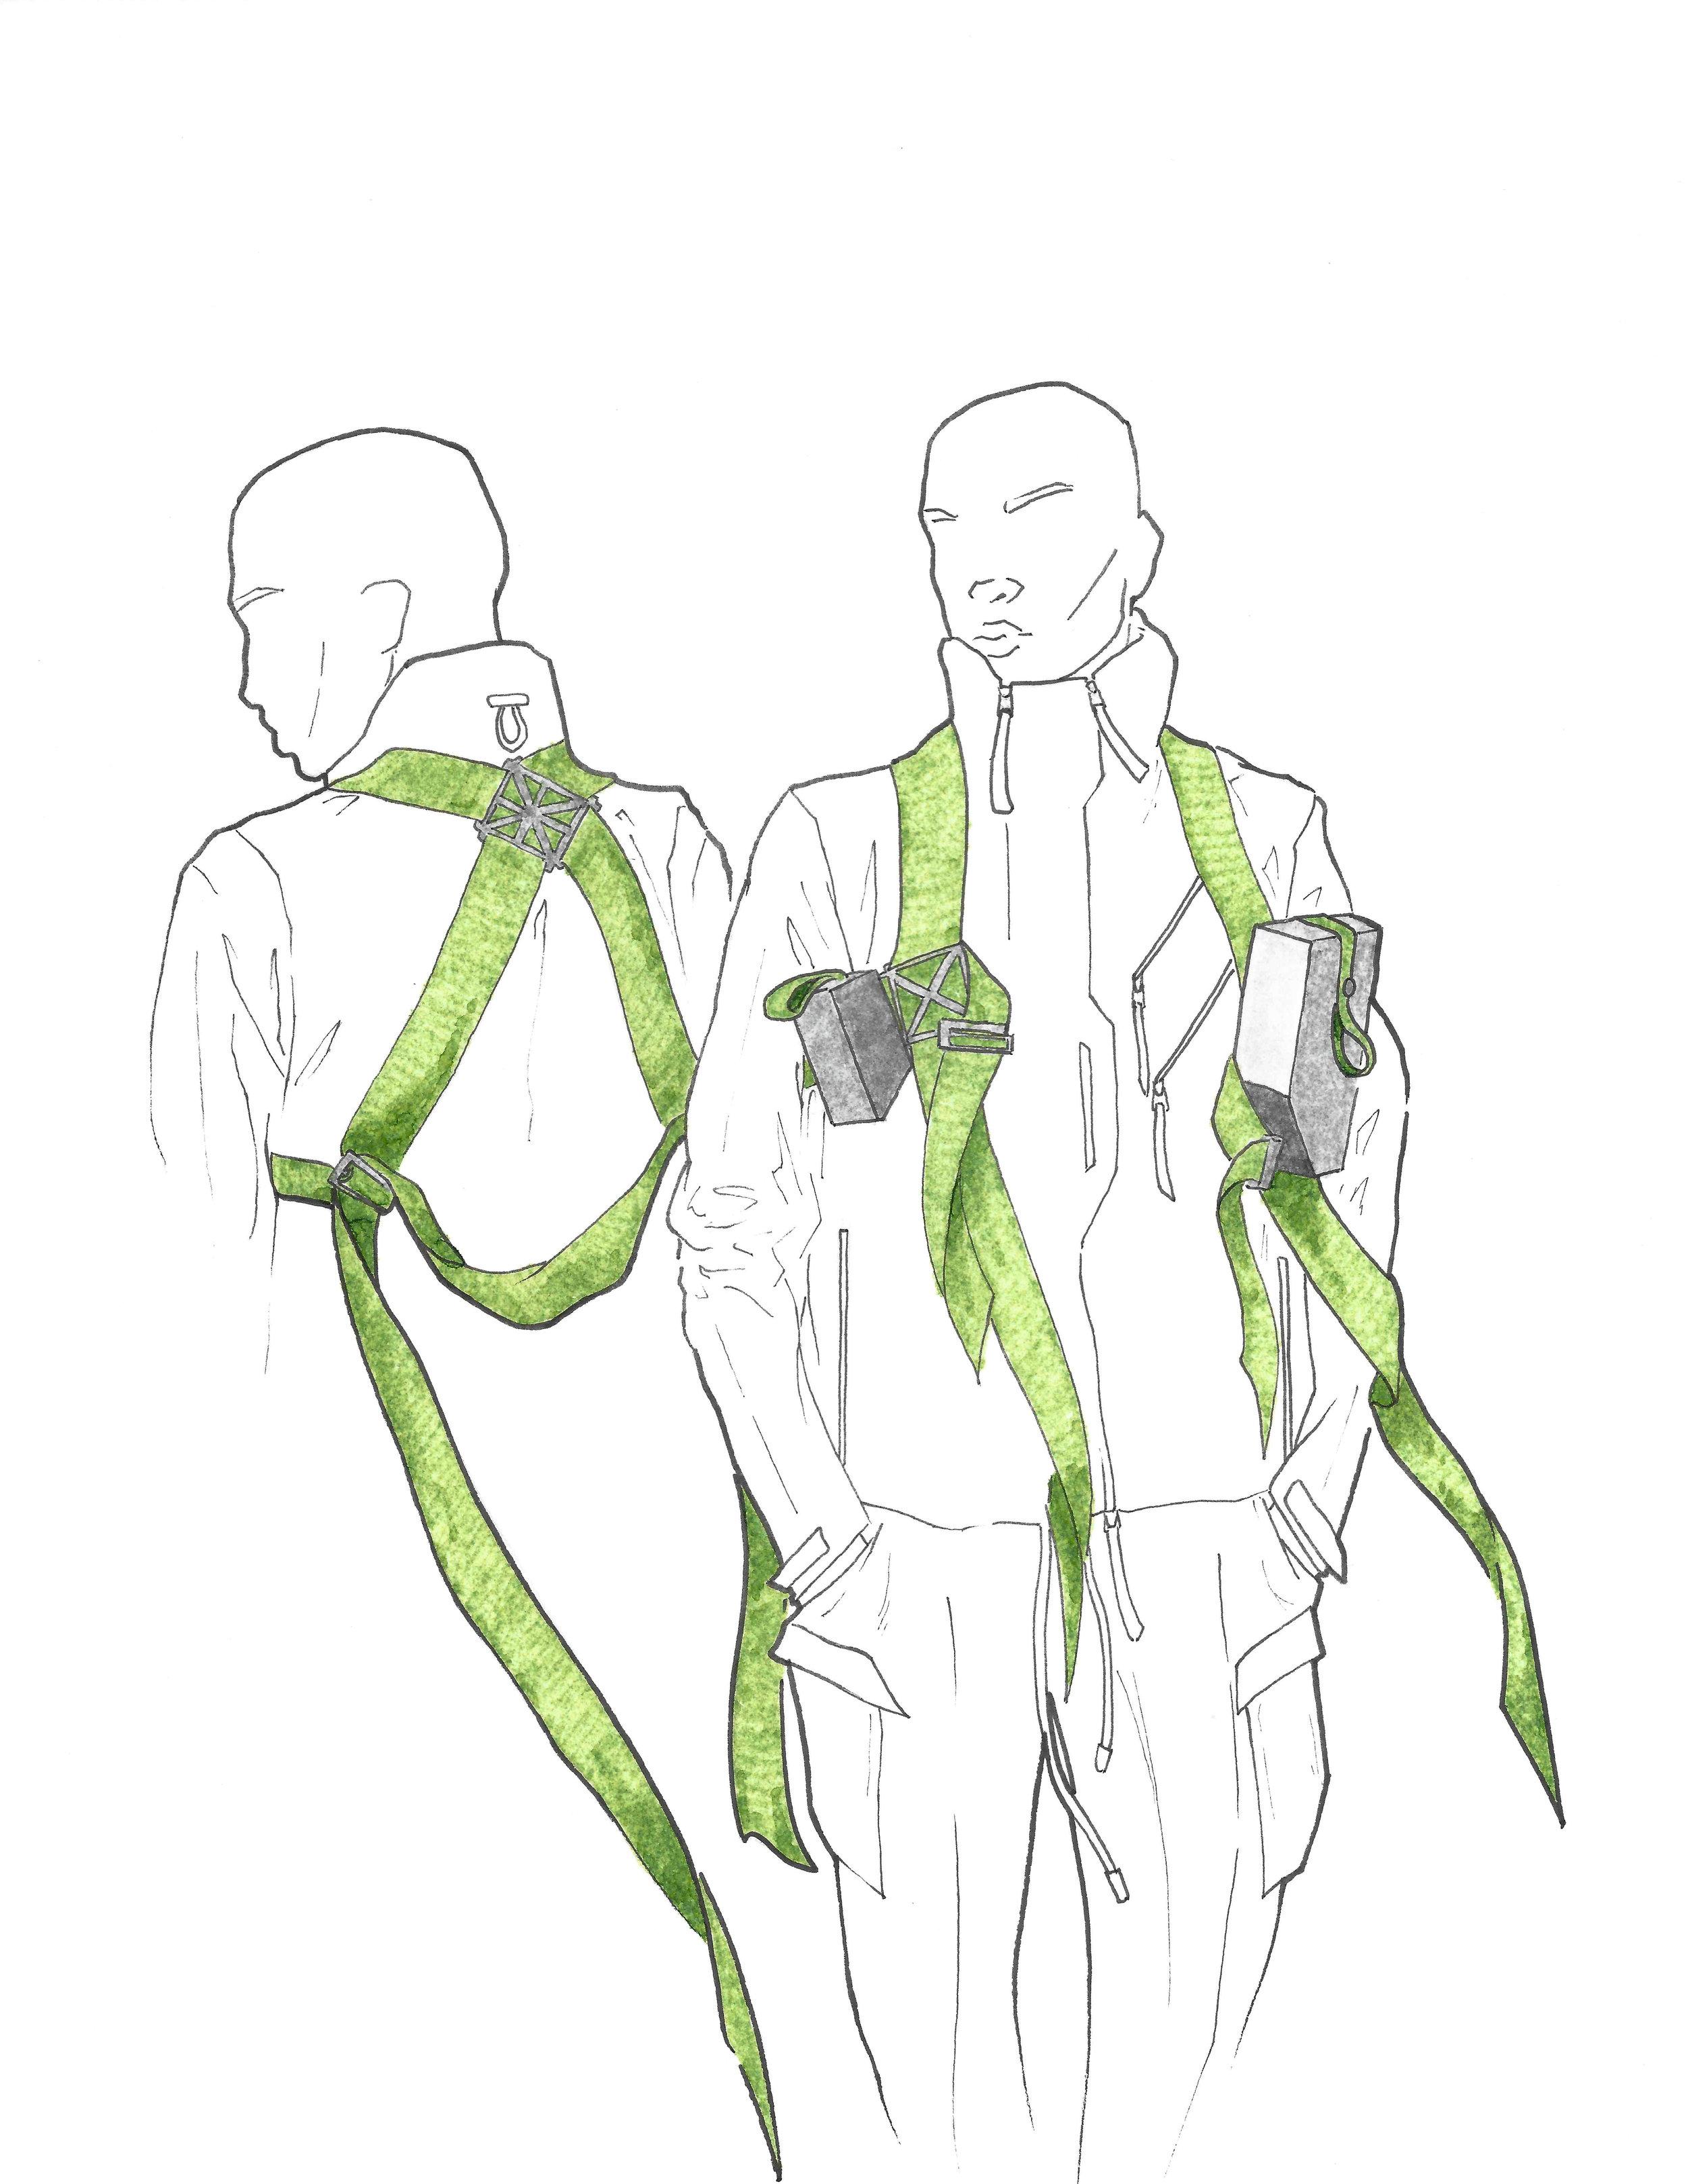 CTSVS1 color sketch-2.JPG